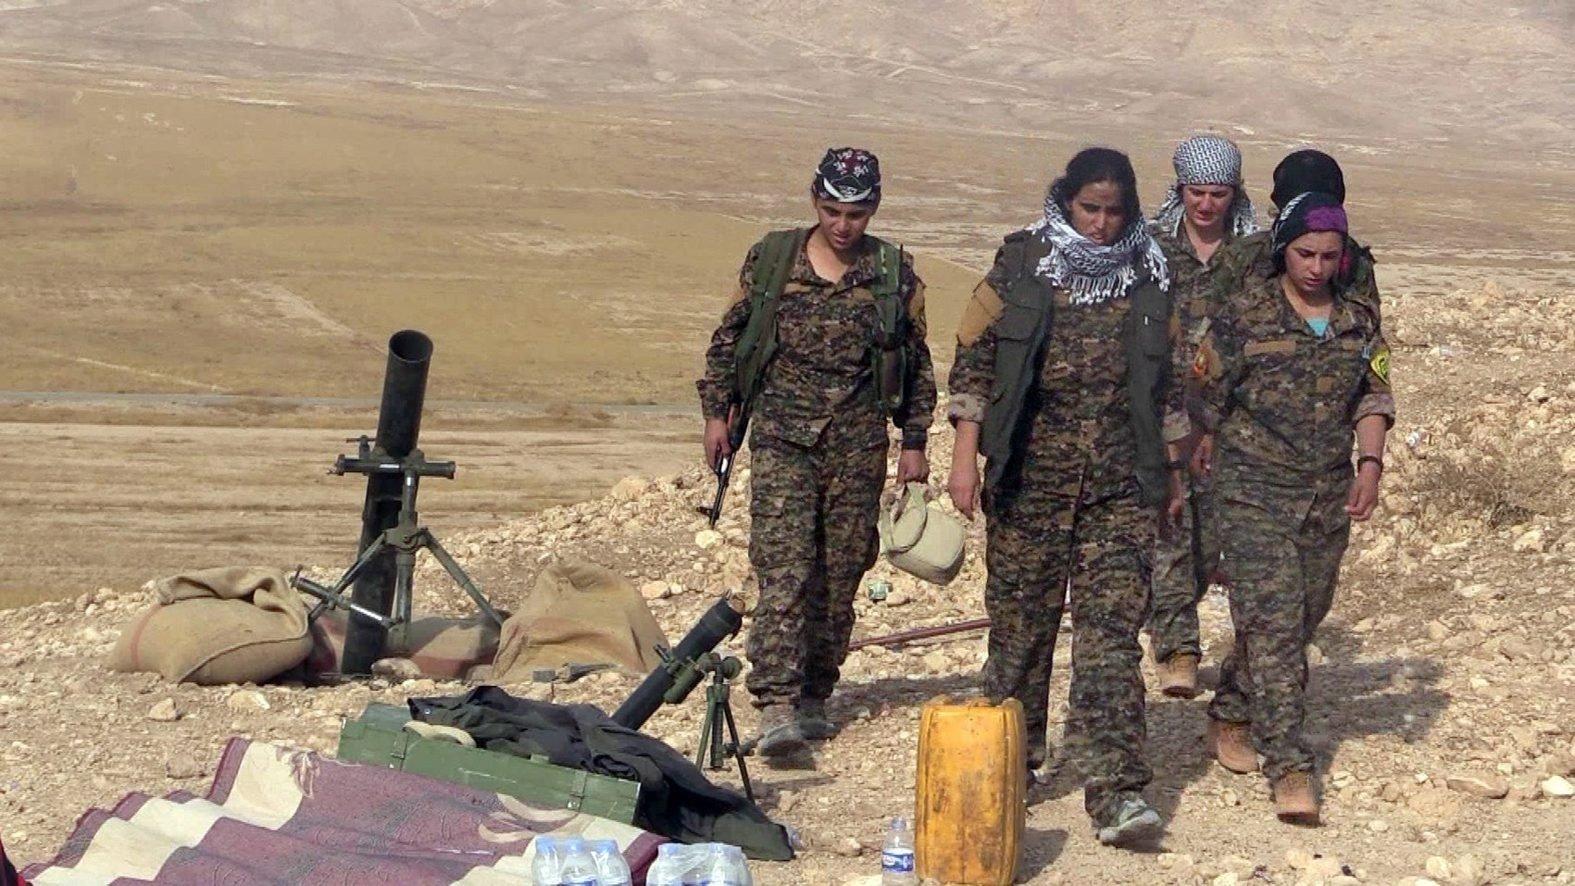 This undated photo shows a group of PKK terrorists in Sinjar, Iraq. (IHA Photo)